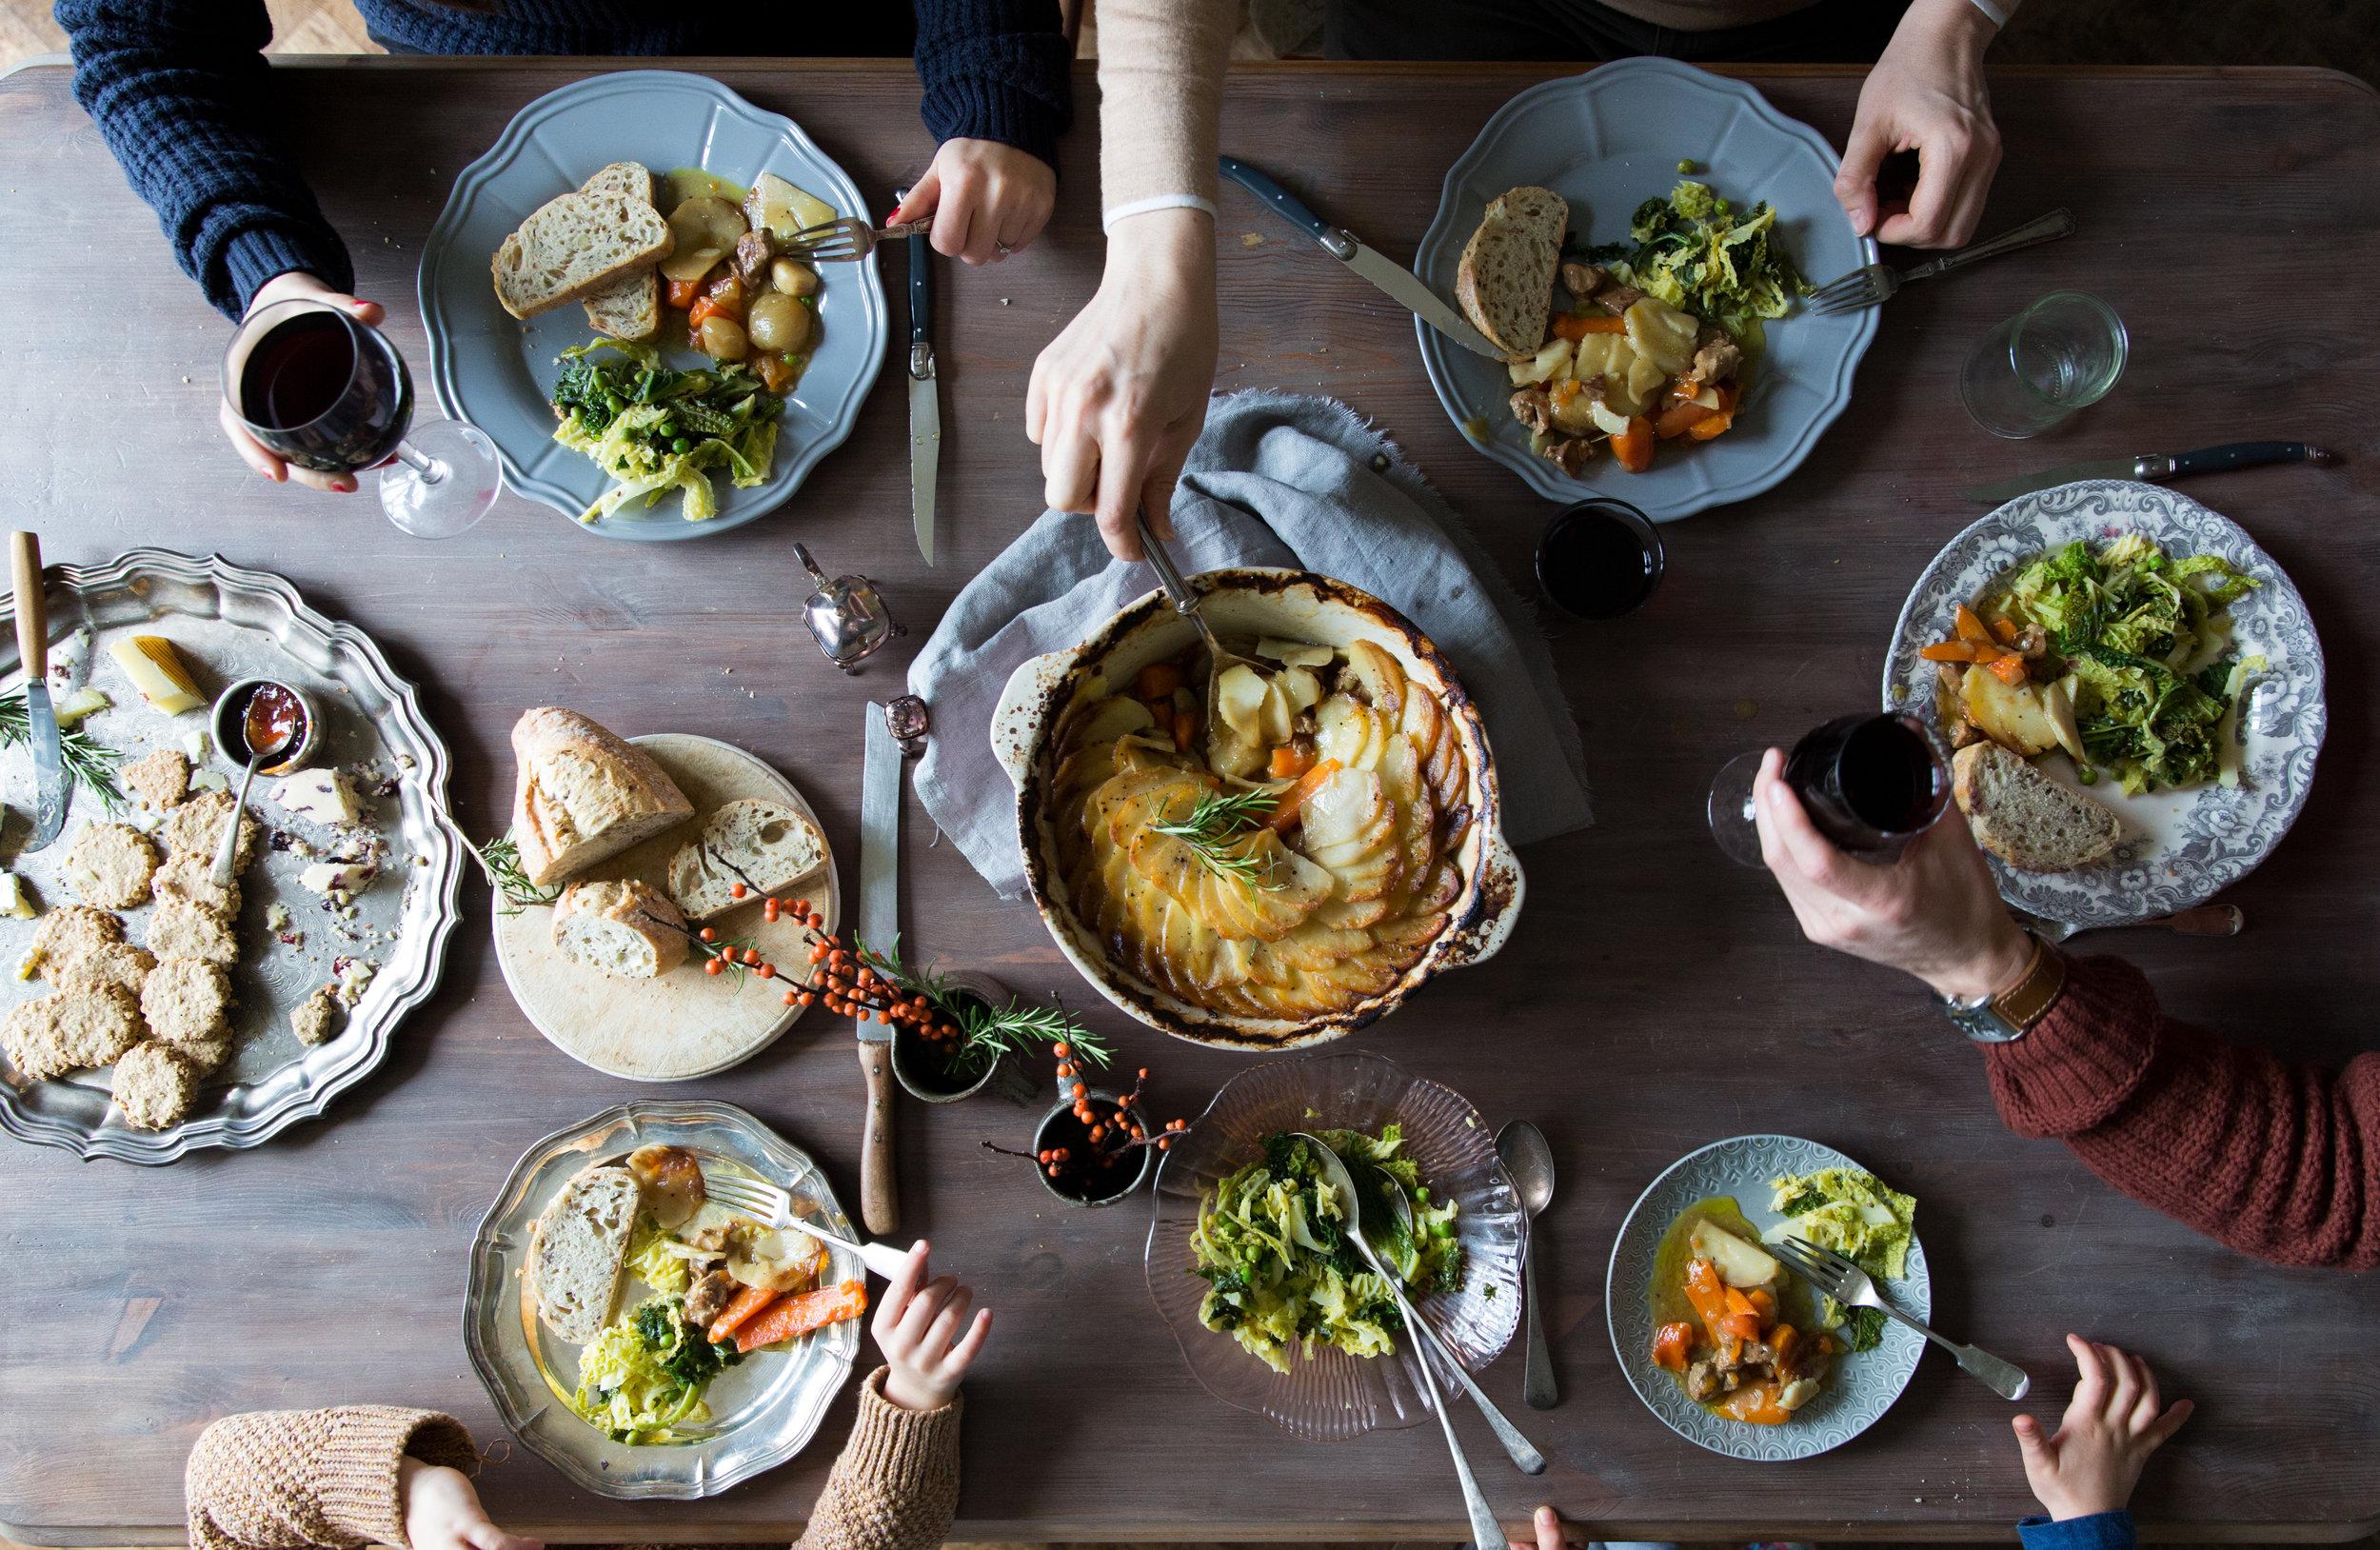 SimpleThingsNov17_Autumn Lunch_31.JPG